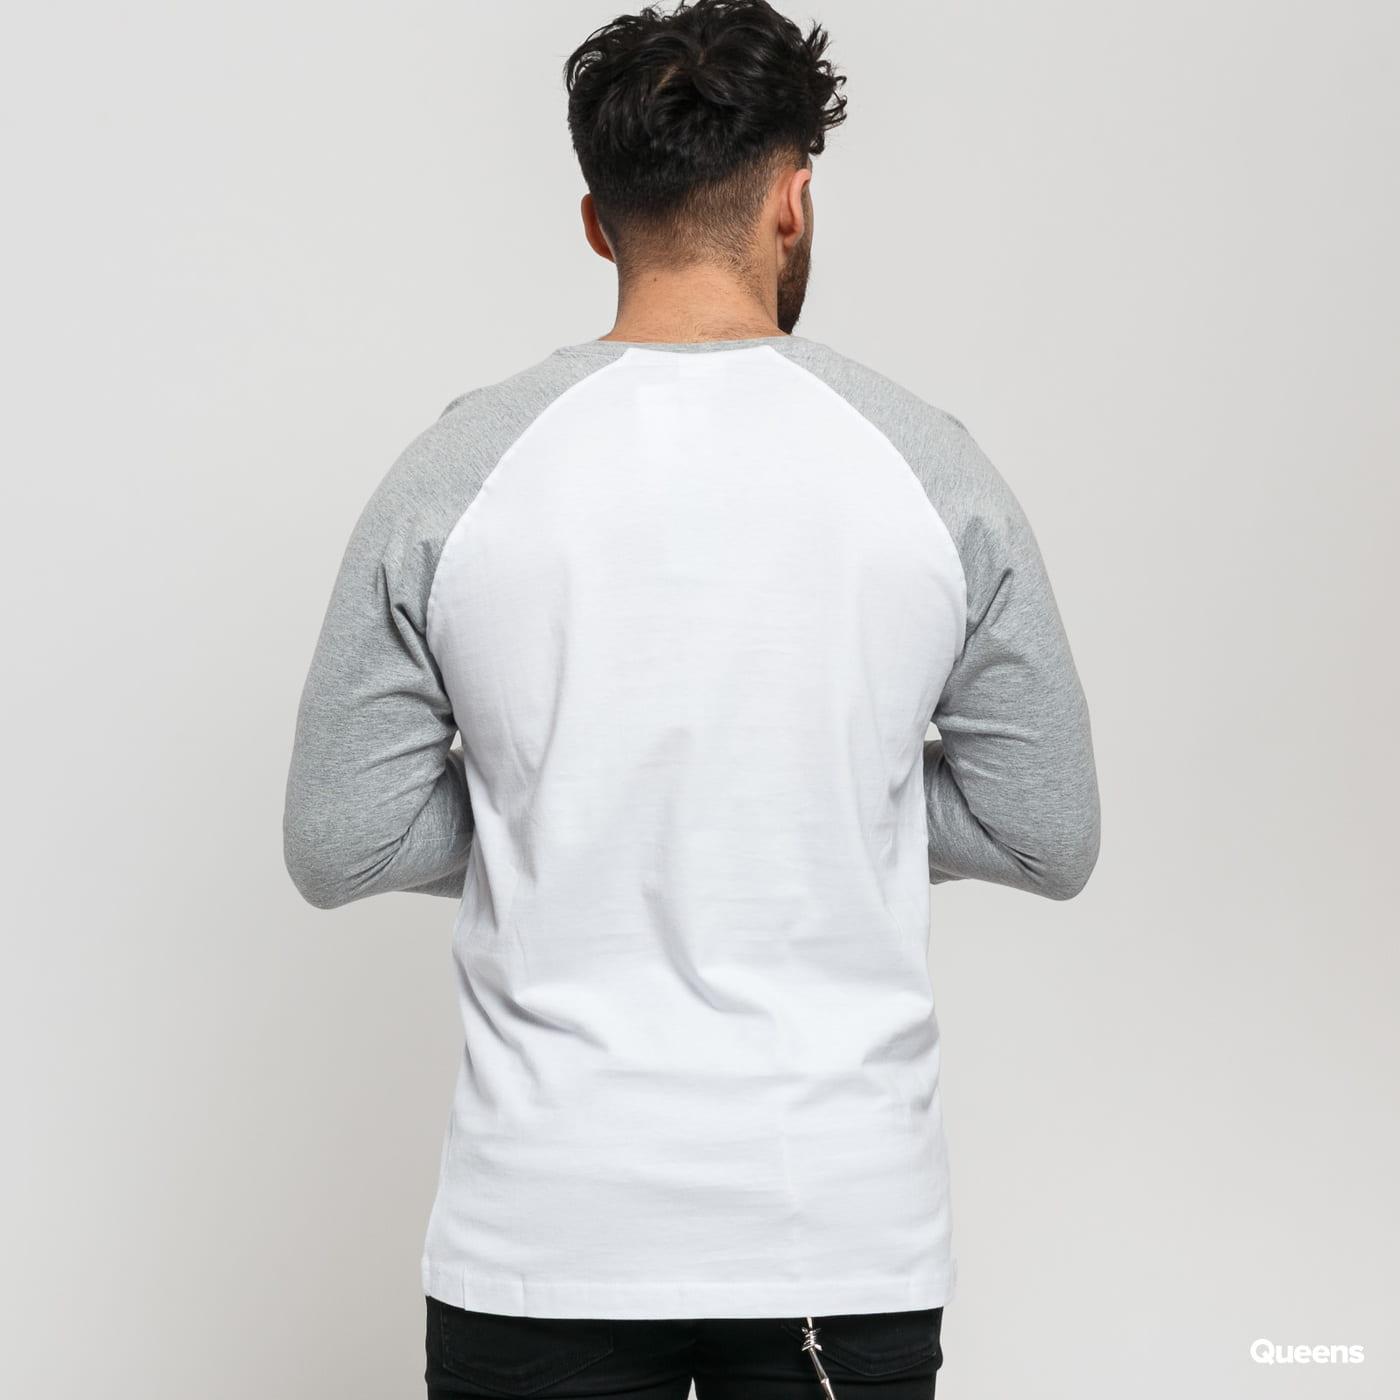 Urban Classics Contrast 3/4 Sleeve Raglan weiß / grau